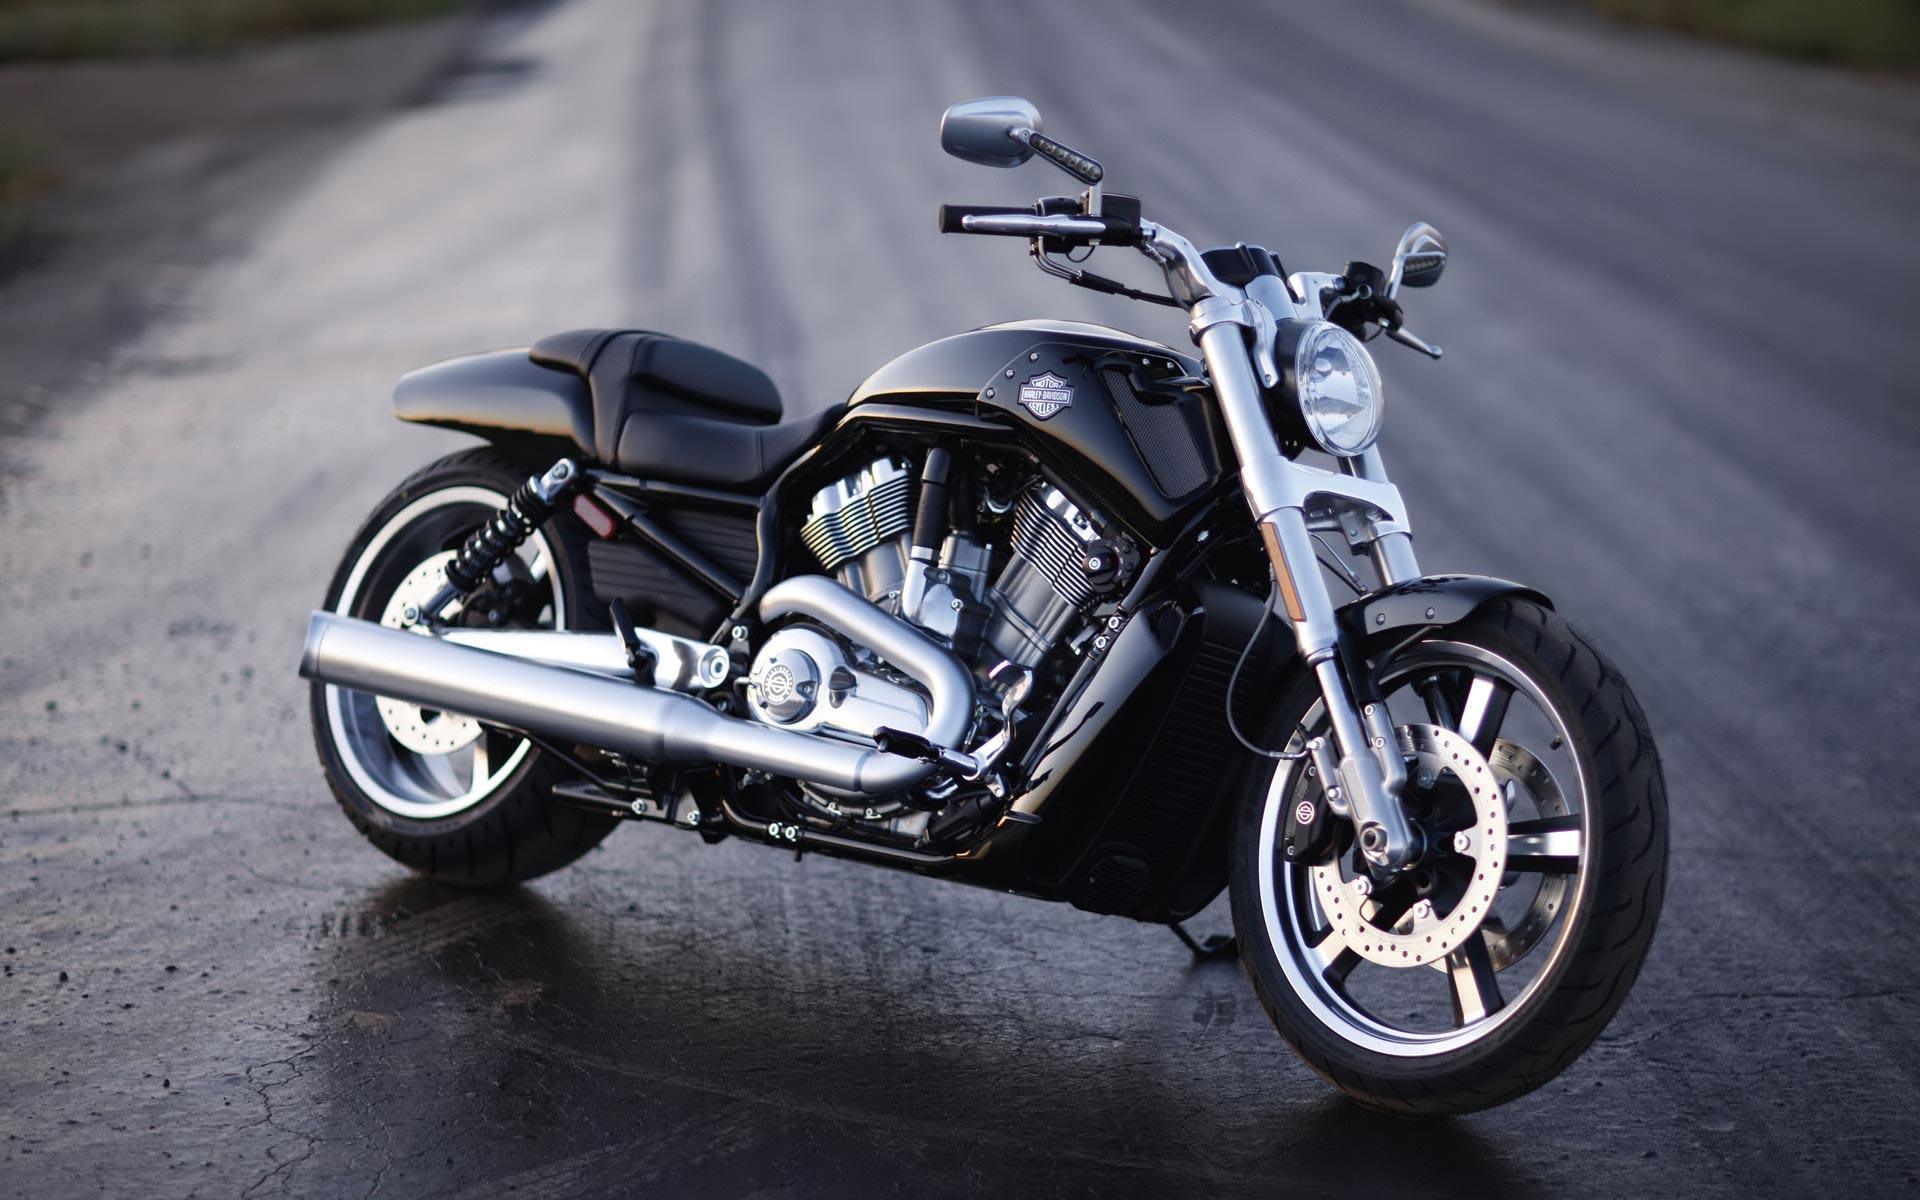 Harley Davidson Motorcycle Wallpaper Backgroun 12125 Full HD ...